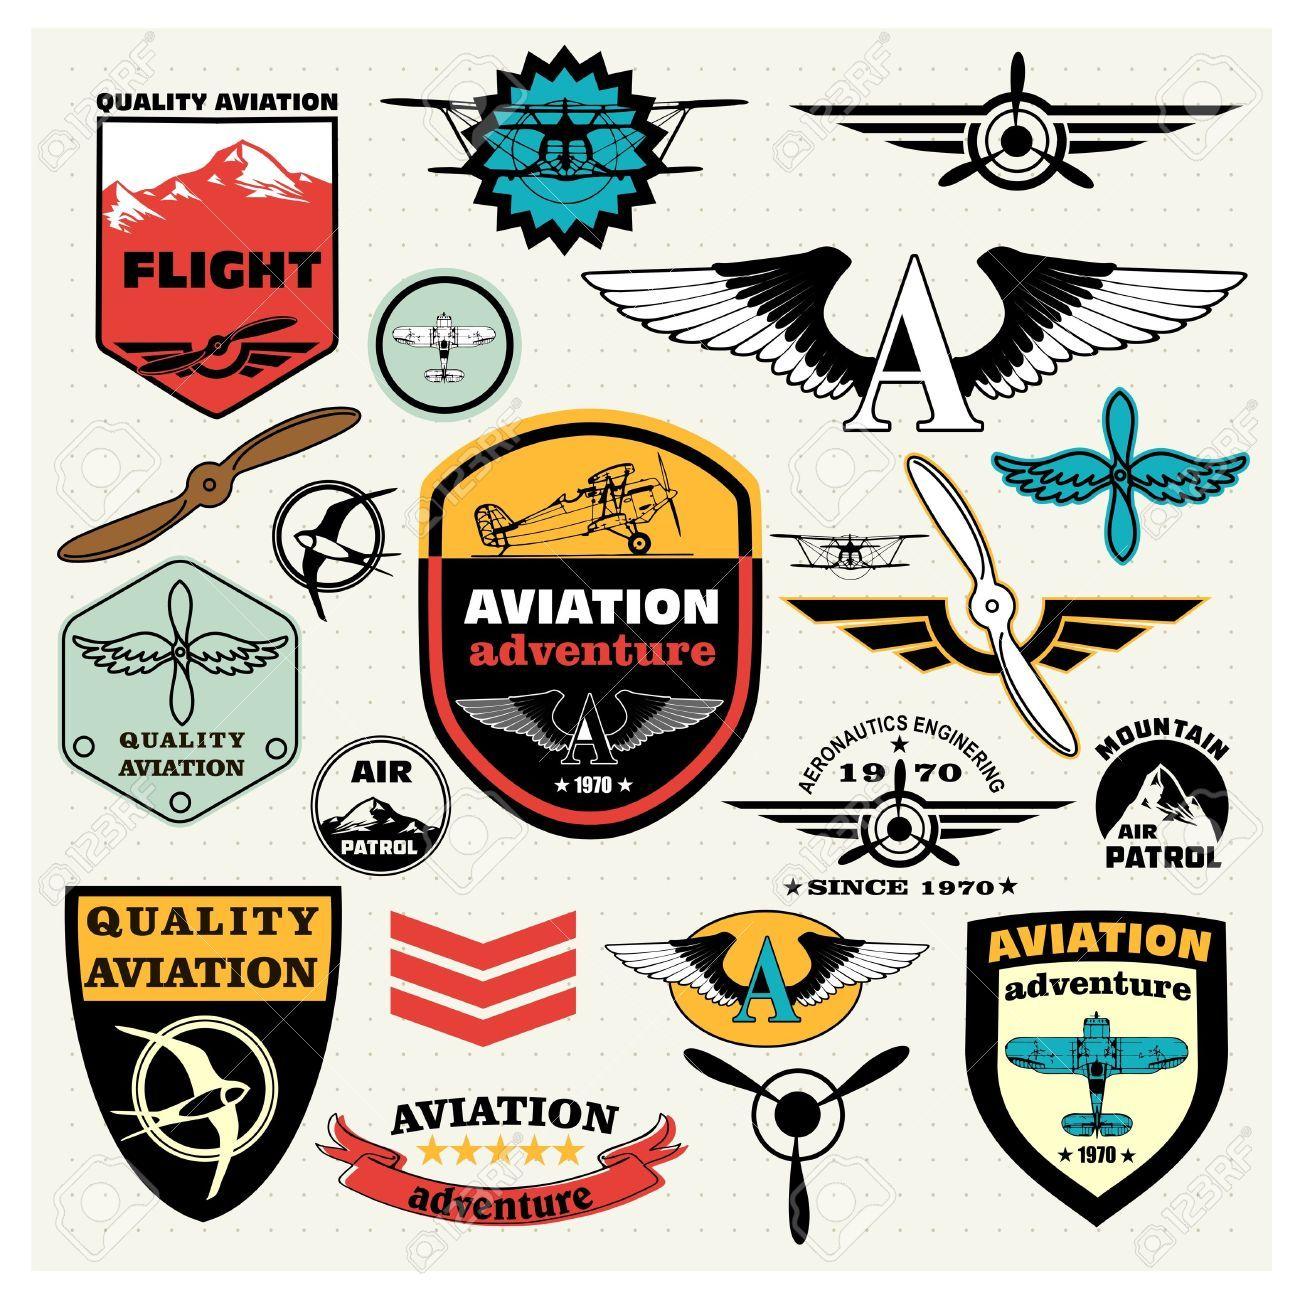 Aviation Logo Stock Photos Images, Royalty Free Aviation